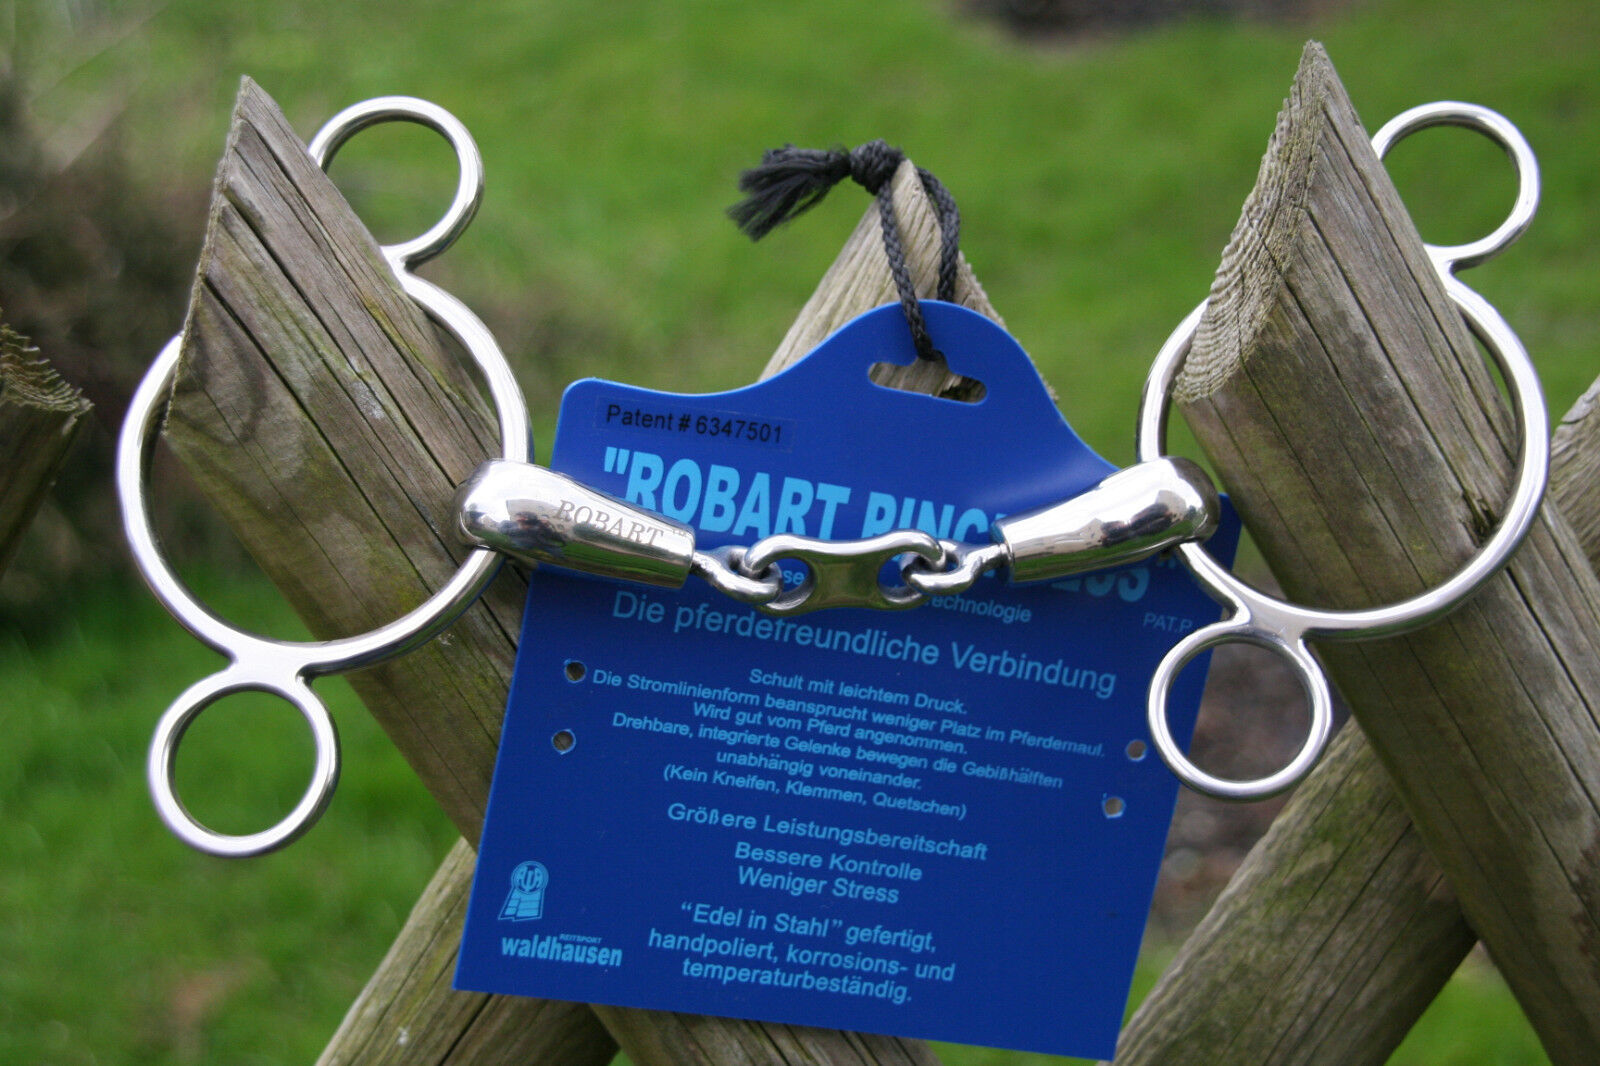 Robart Robart Robart Pinchless Edelstahl Gebiss doppelt gebrochen 12,5 cm 18 mm Dreiringtrense 738a42